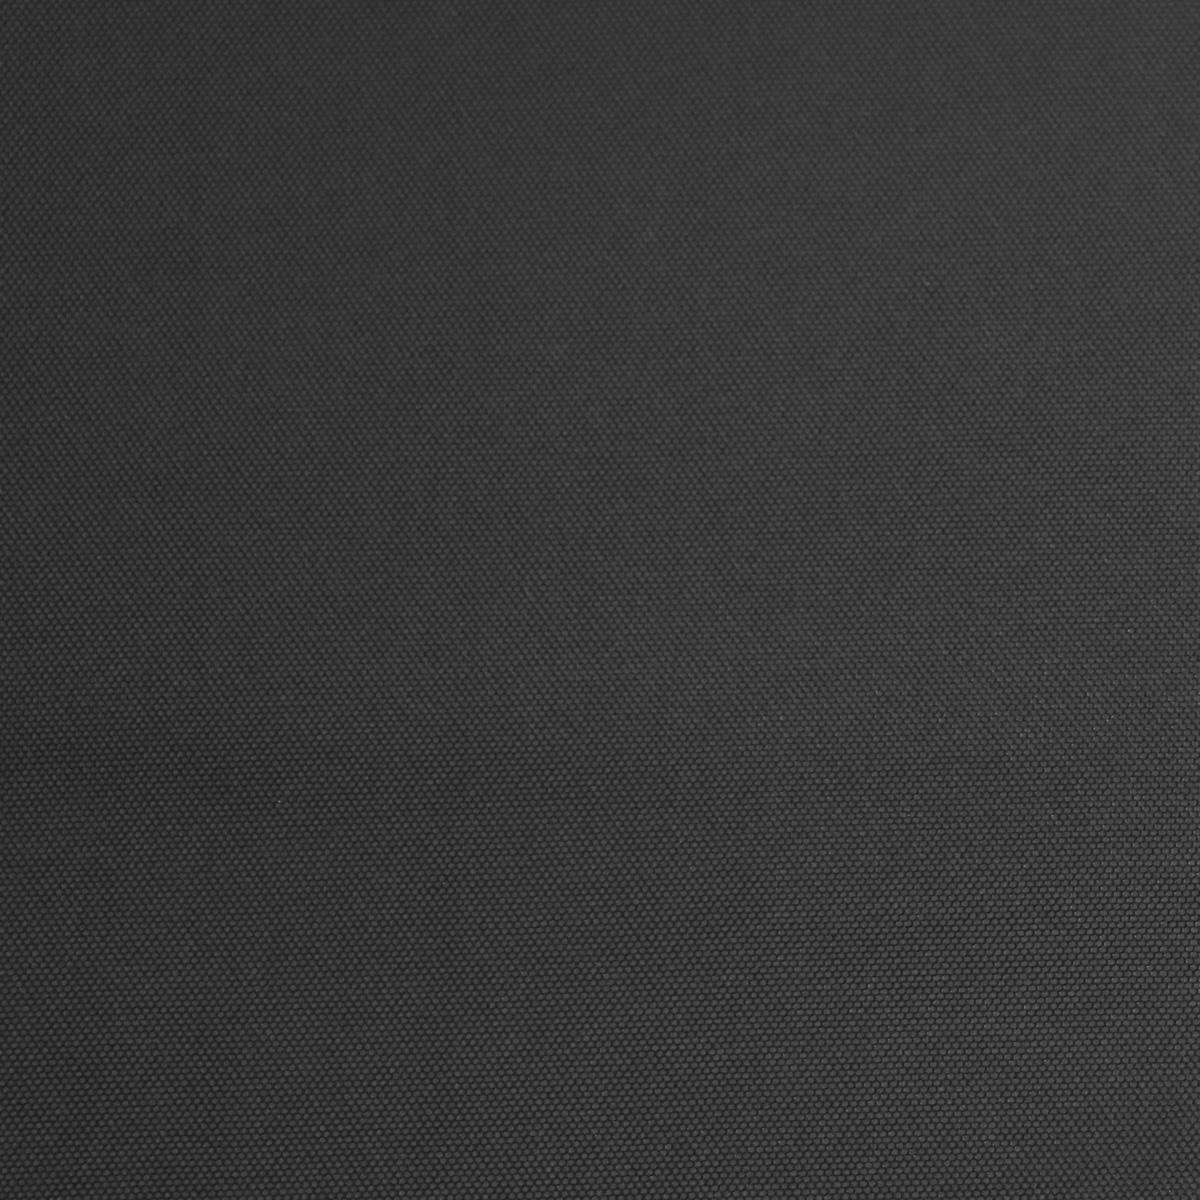 outdoor waterproof wasserdicht polyester uni anthrazit alle stoffe stoffe uni kunstfasern. Black Bedroom Furniture Sets. Home Design Ideas